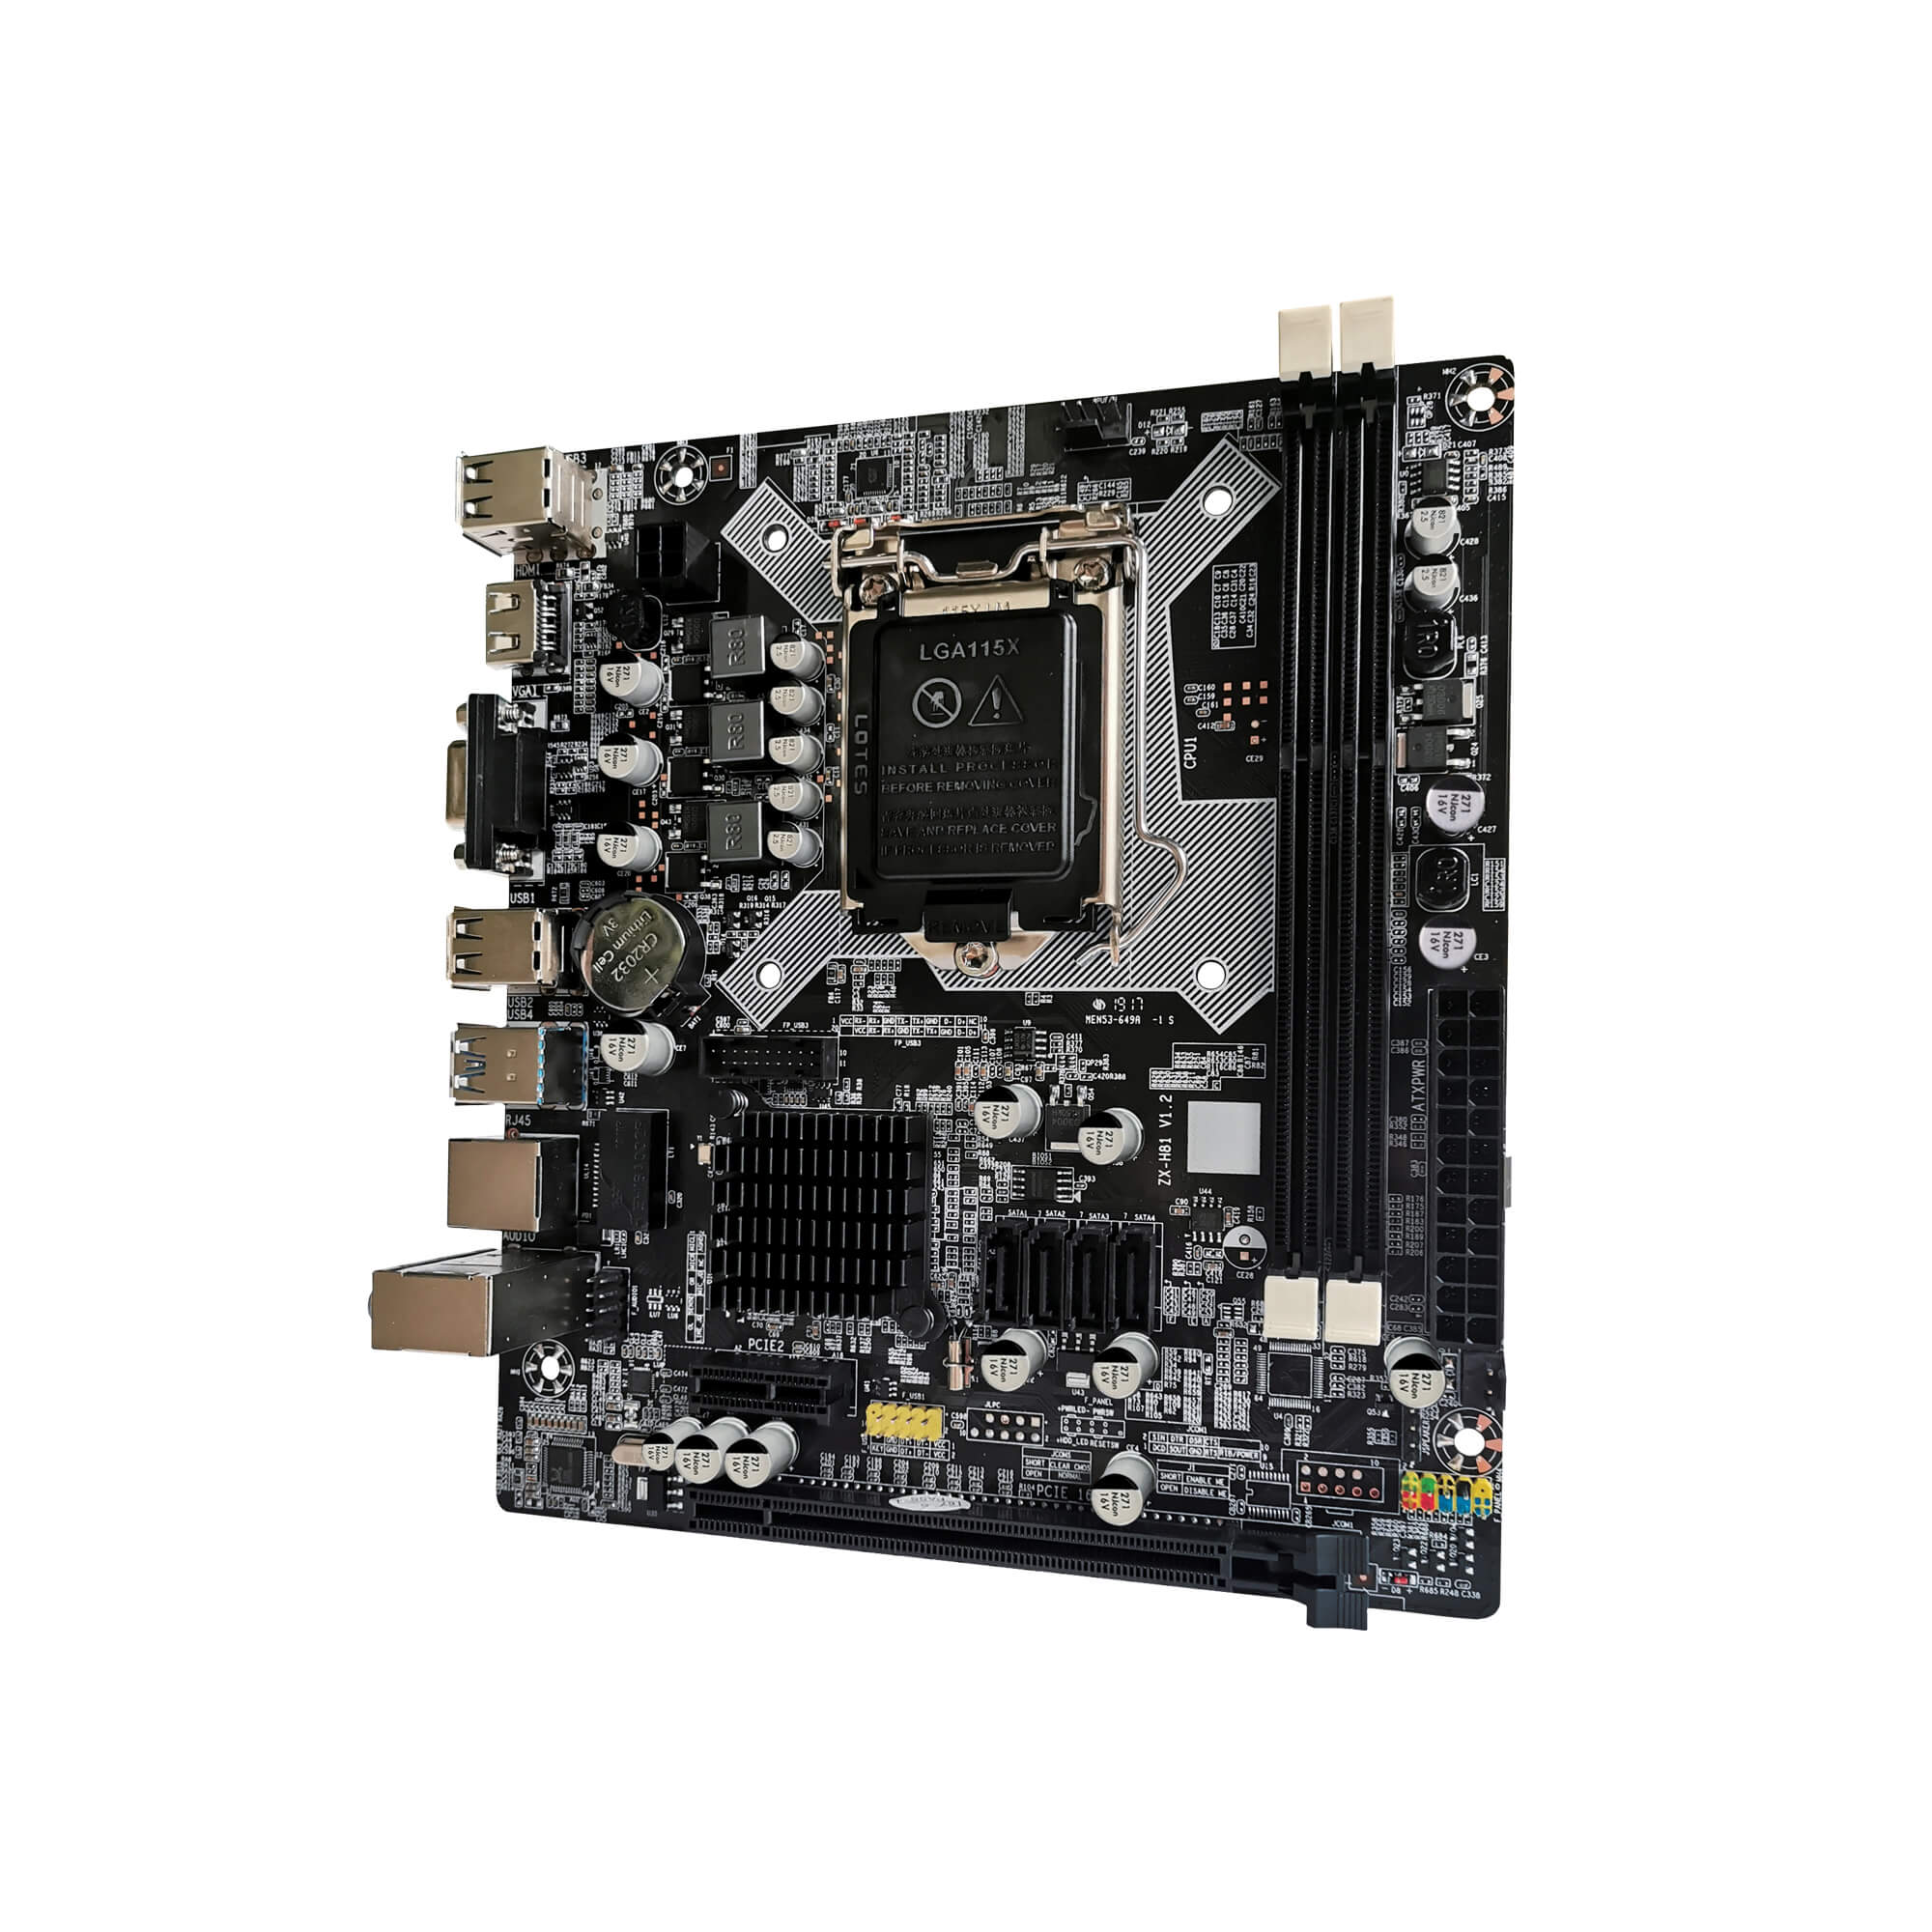 Placa mãe BlueCase BMBH81 D2 H81 LGA 1150 DDR3